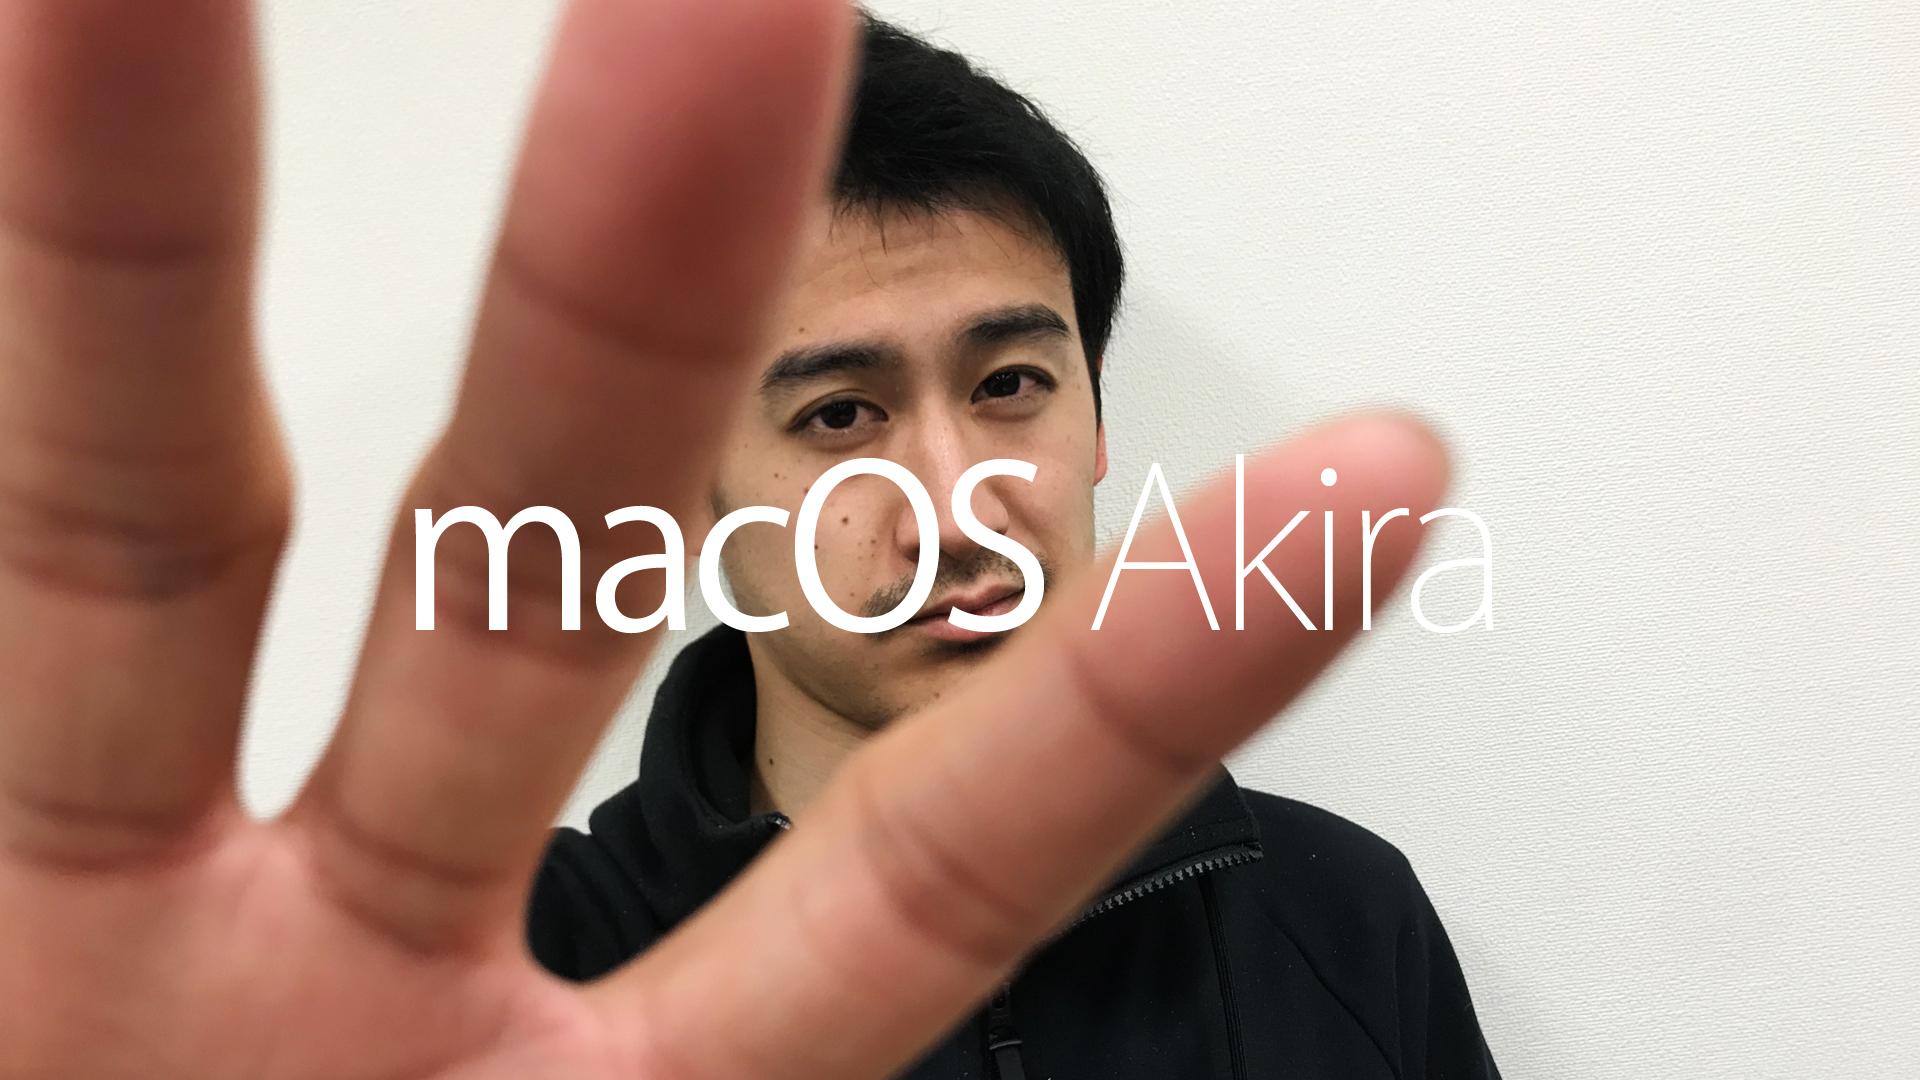 Mac OS Akira